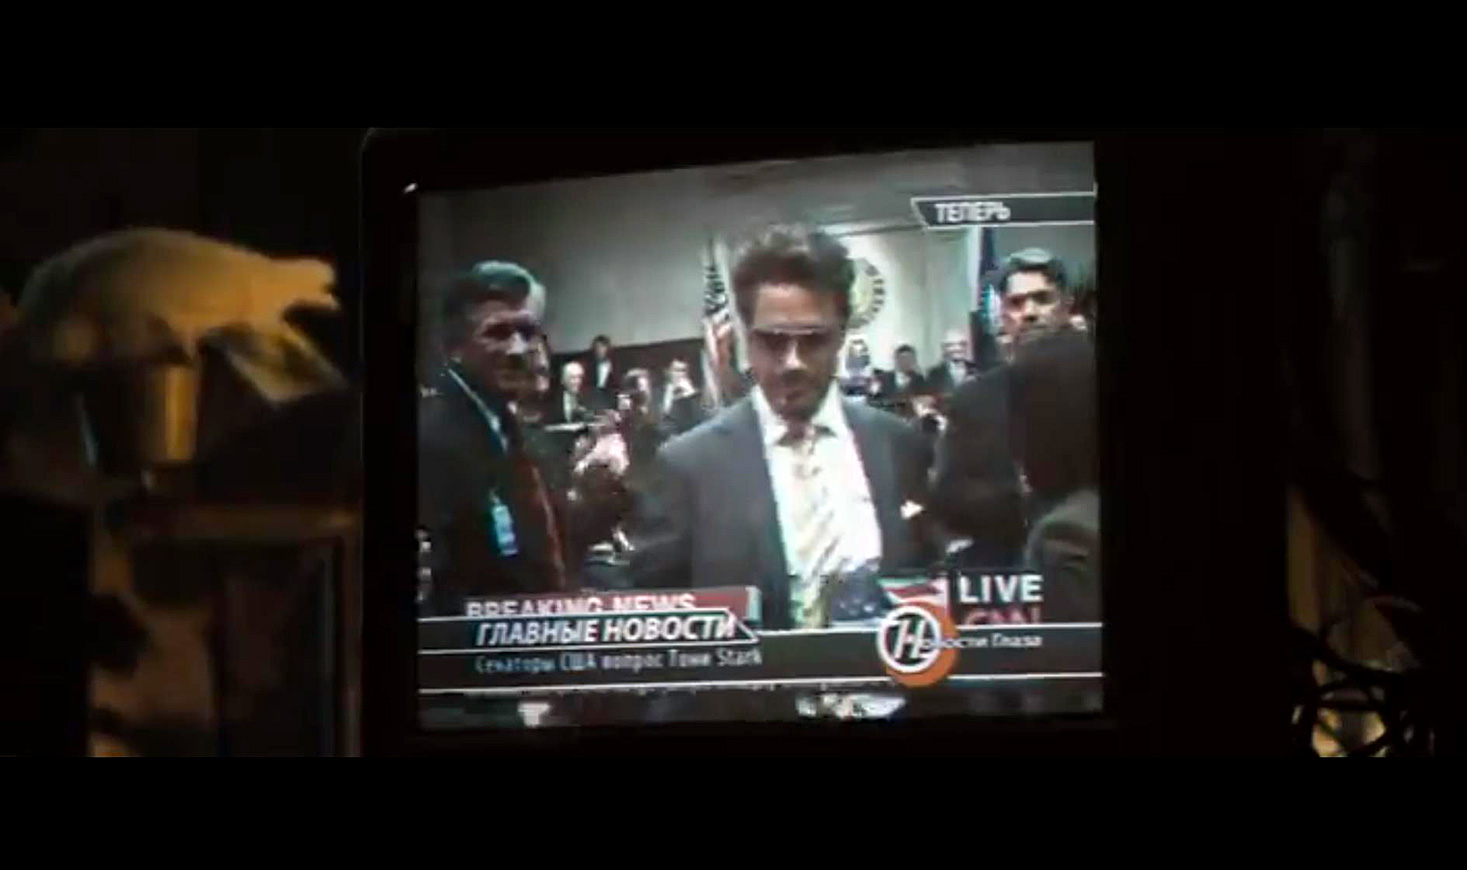 Iron Man 2. Sumber: Cuplikan layar dari film